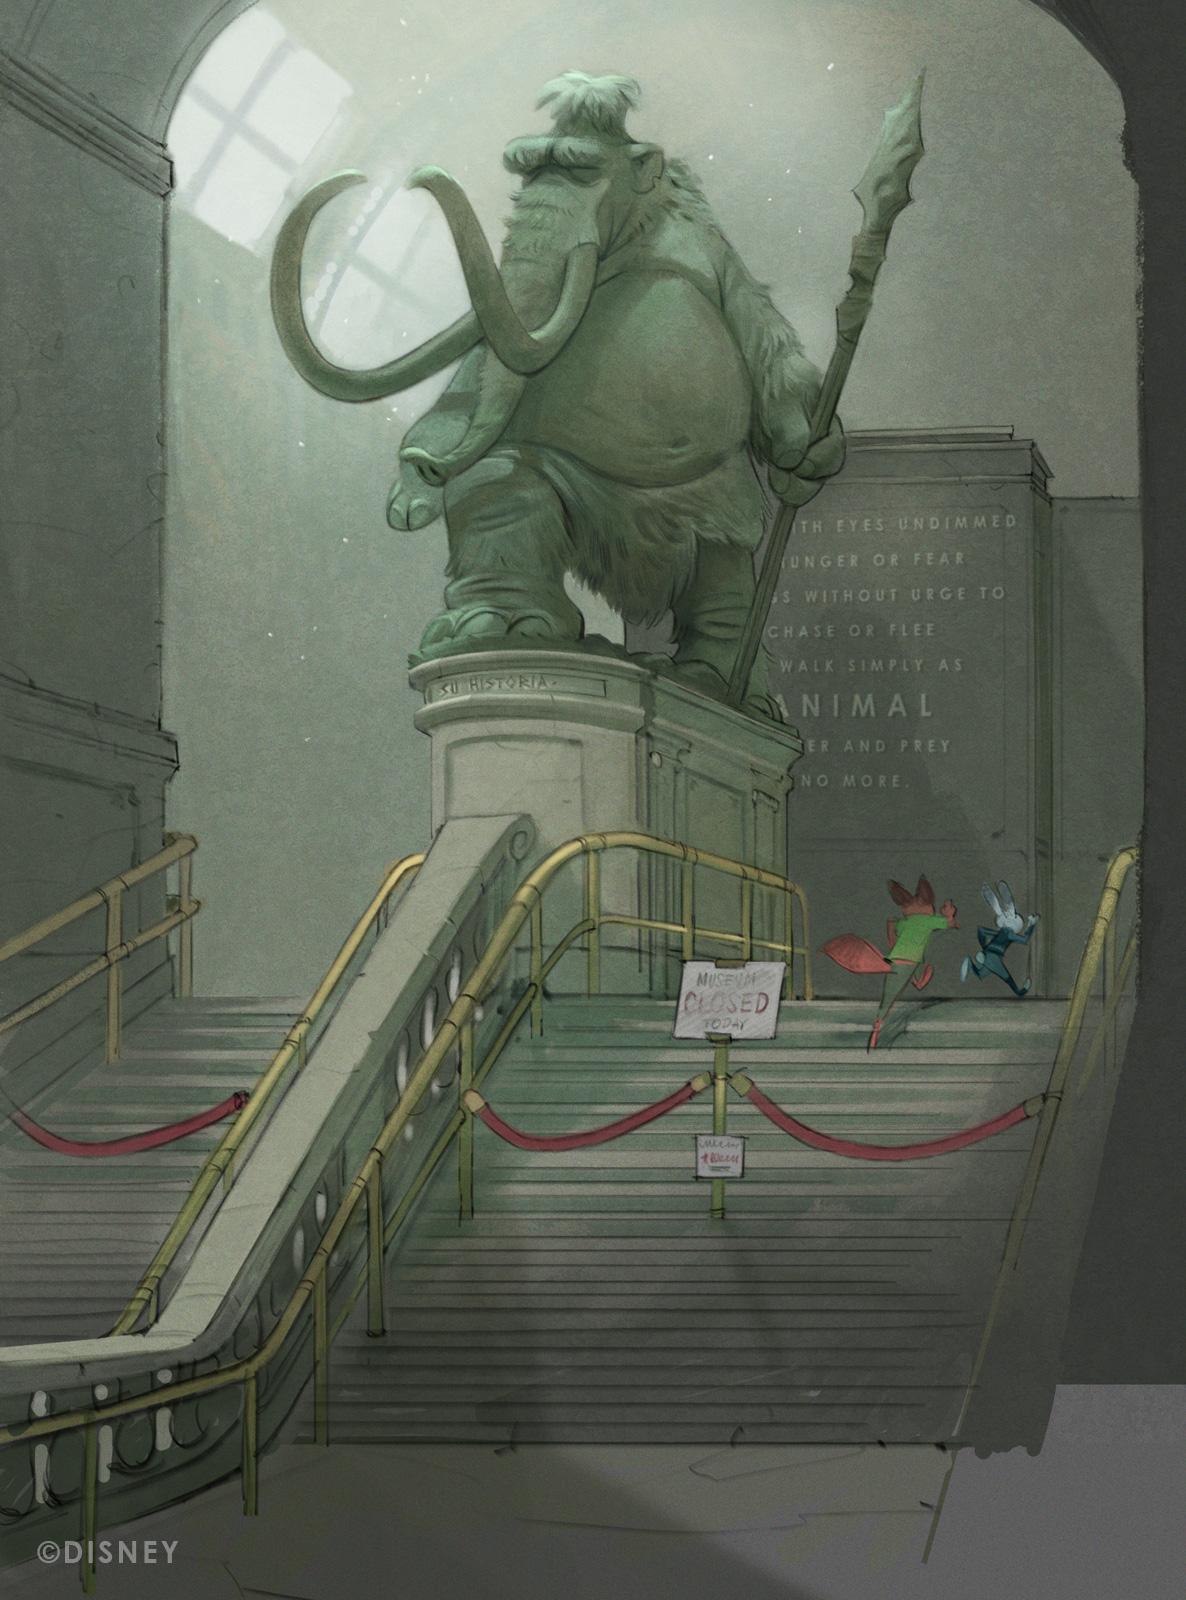 Zootopia Concept Art By Cory Loftis